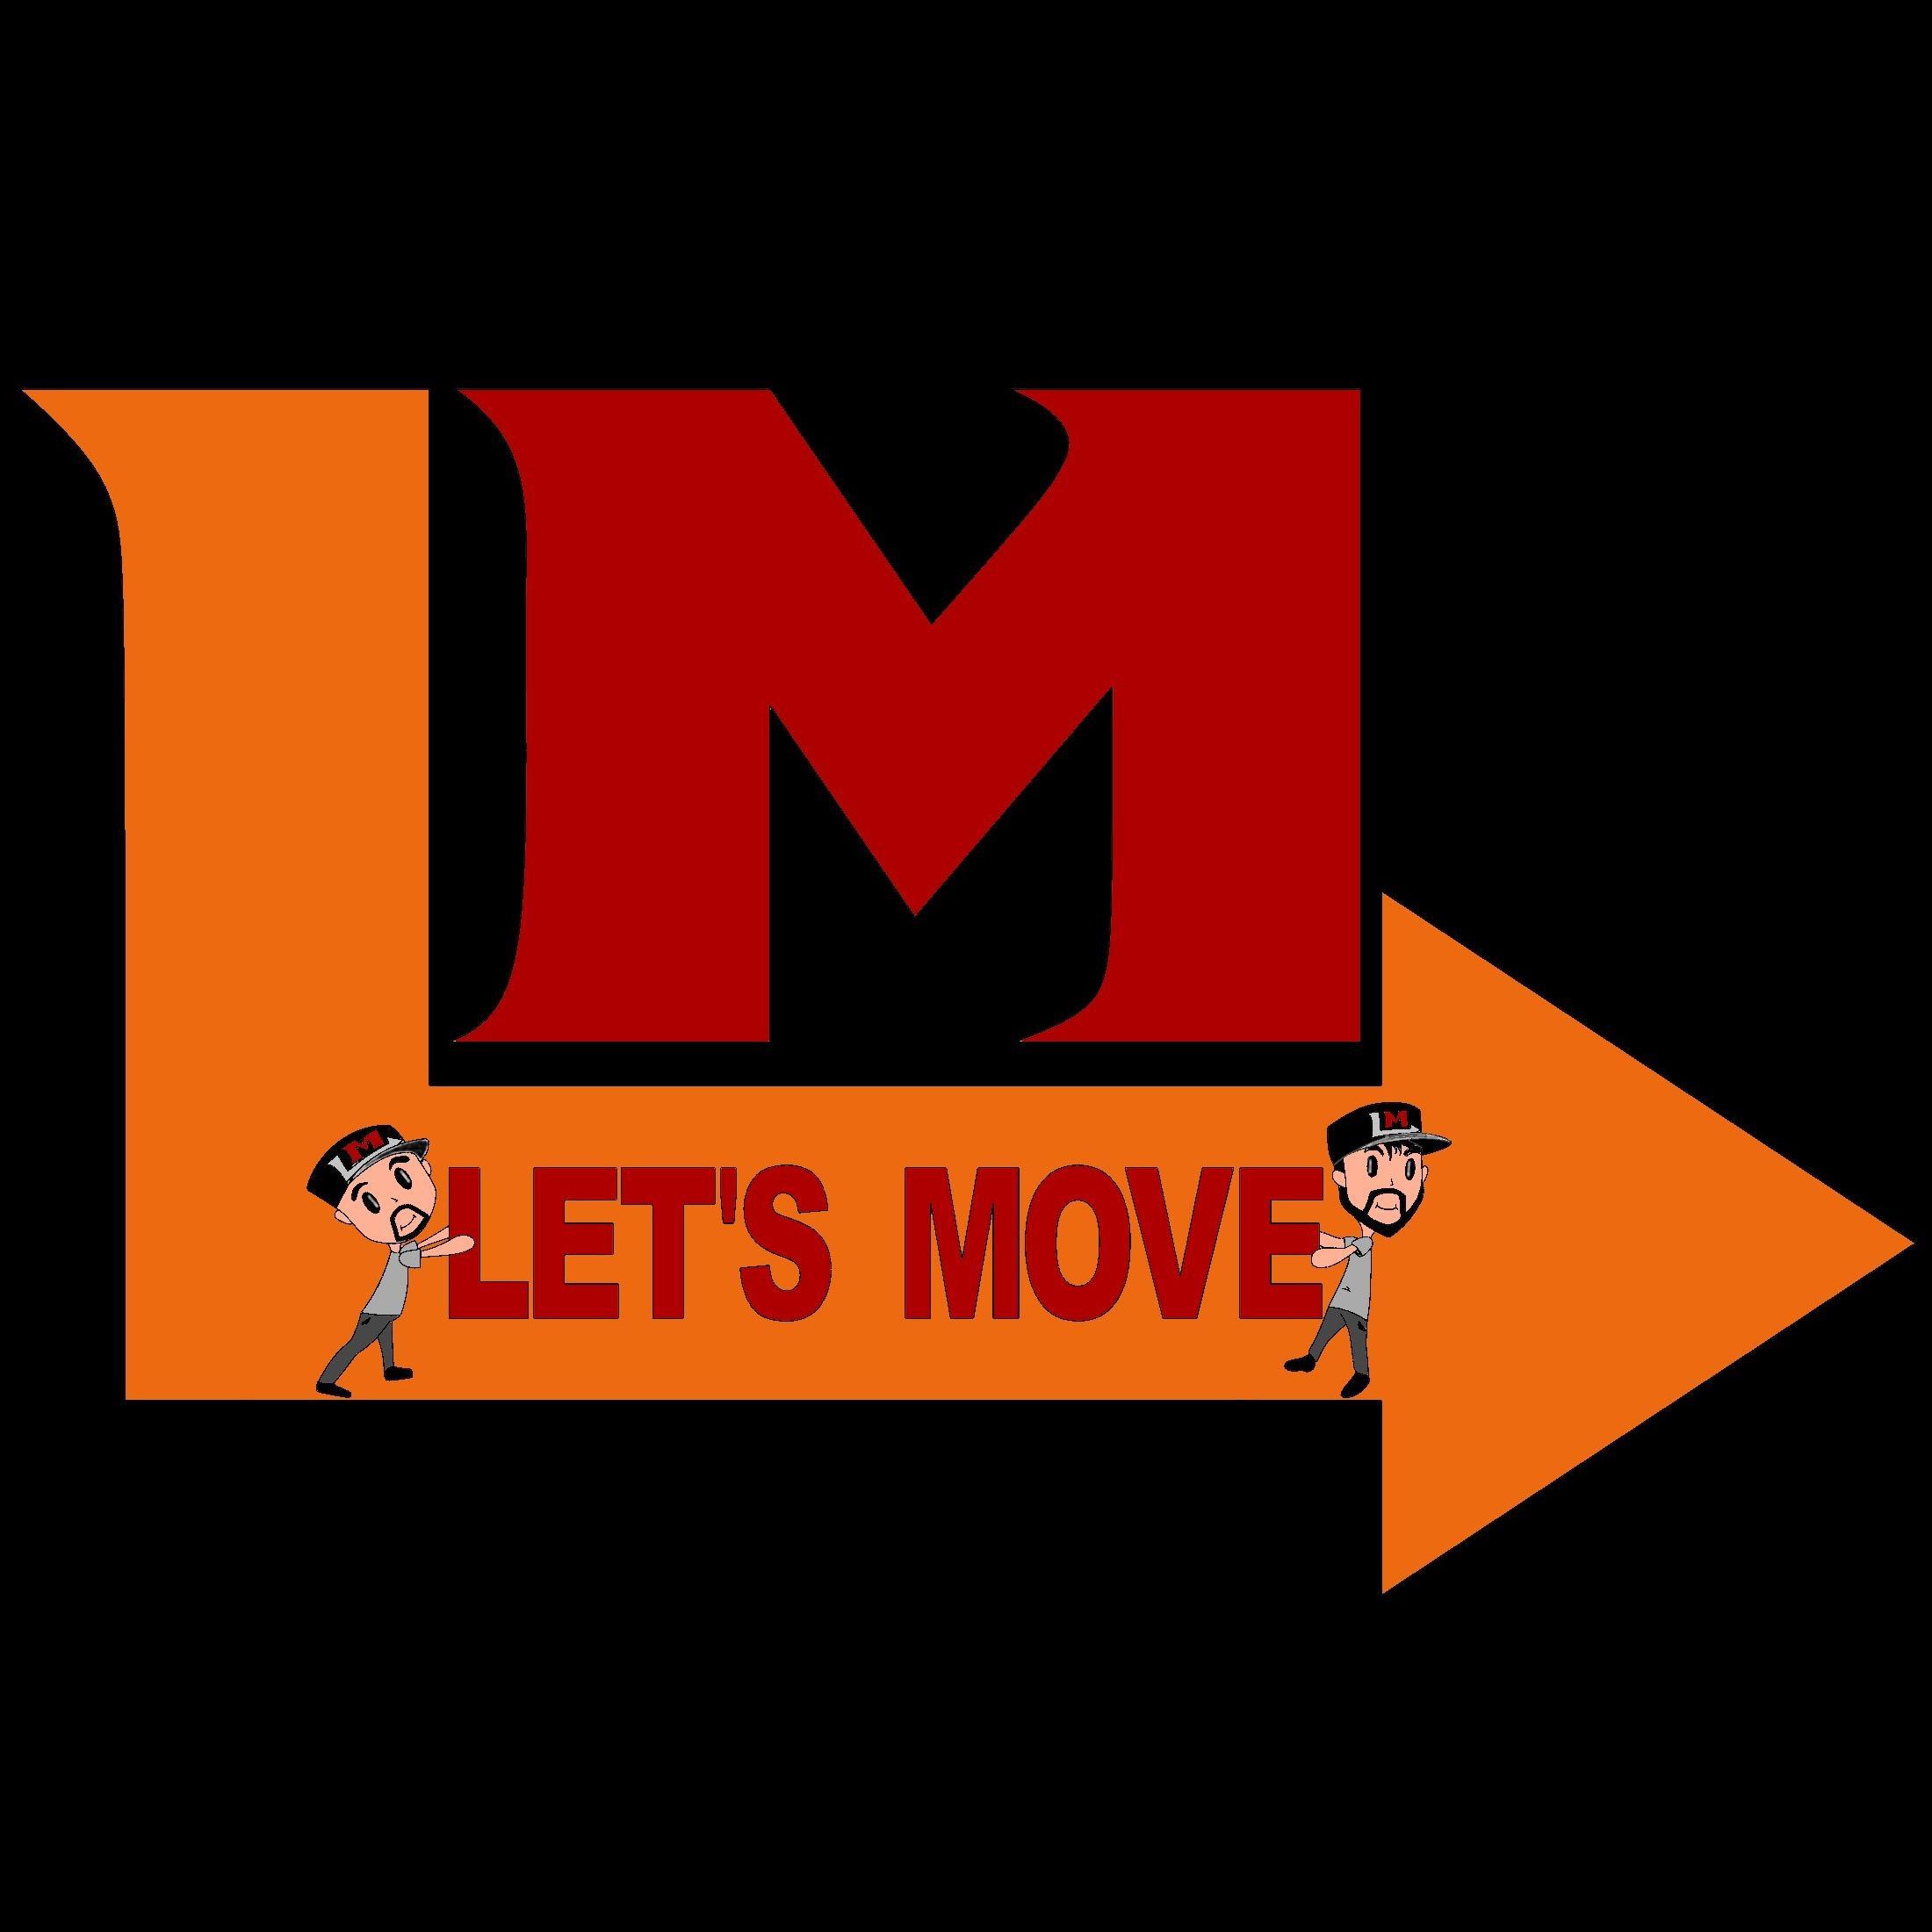 Let's Move, LLC